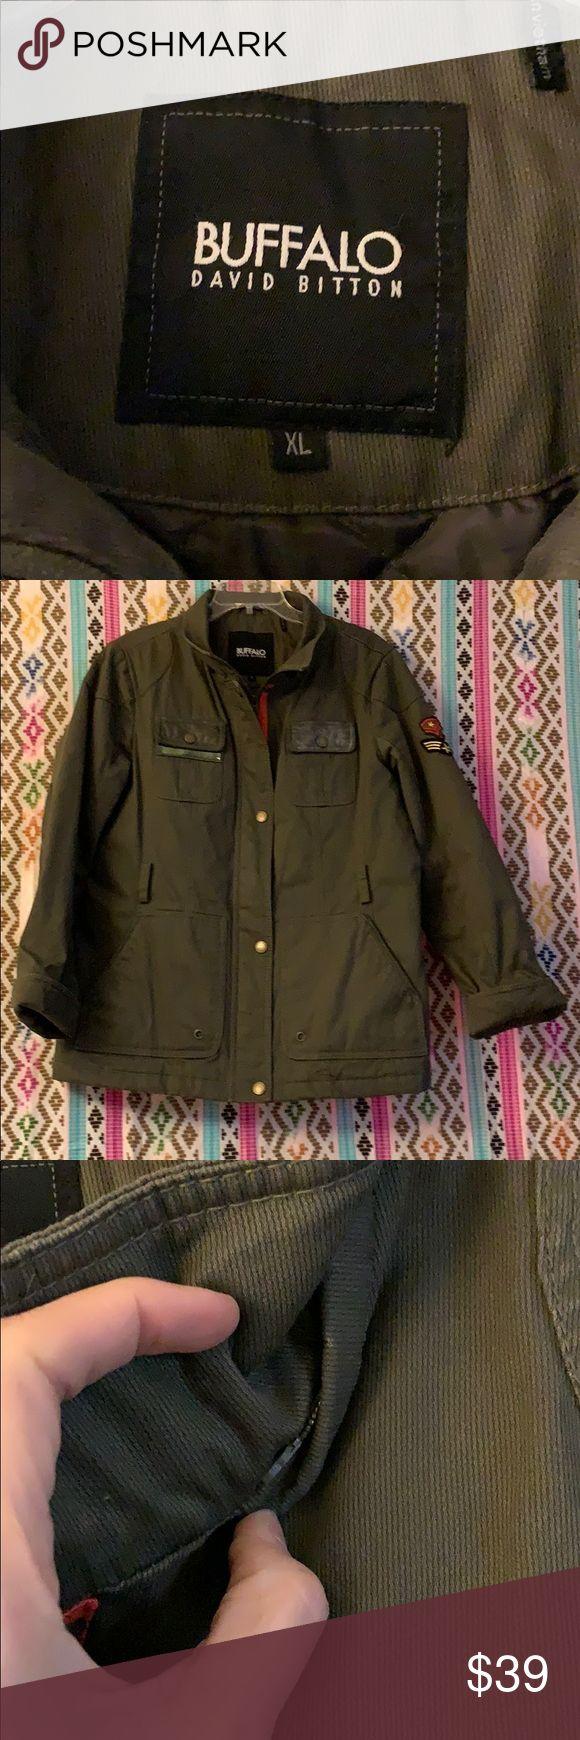 Buffalo David Bitton Size Xl Army Green Coat Army Green Coat Green Coat Clothes Design [ 1740 x 580 Pixel ]